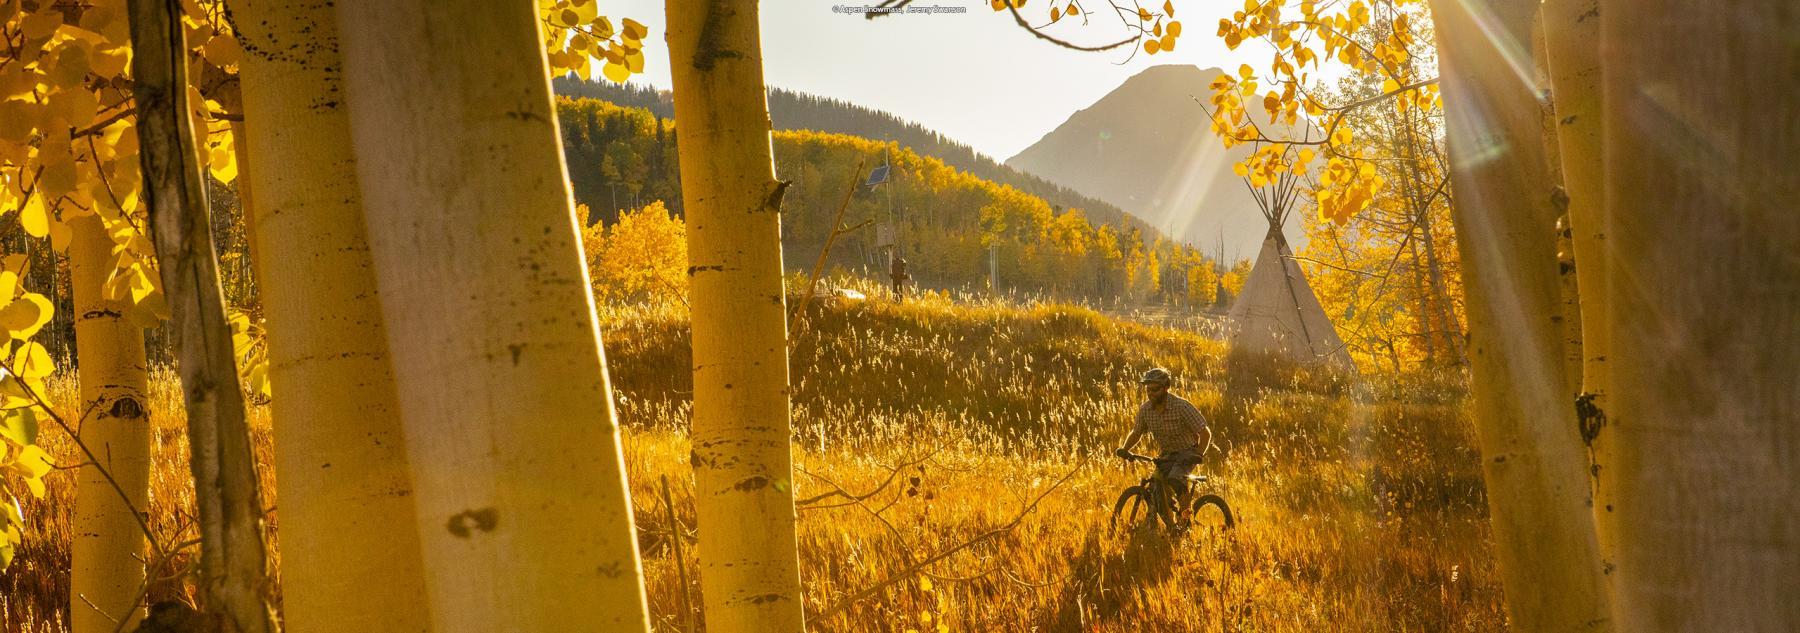 Aspen Biking in the Fall